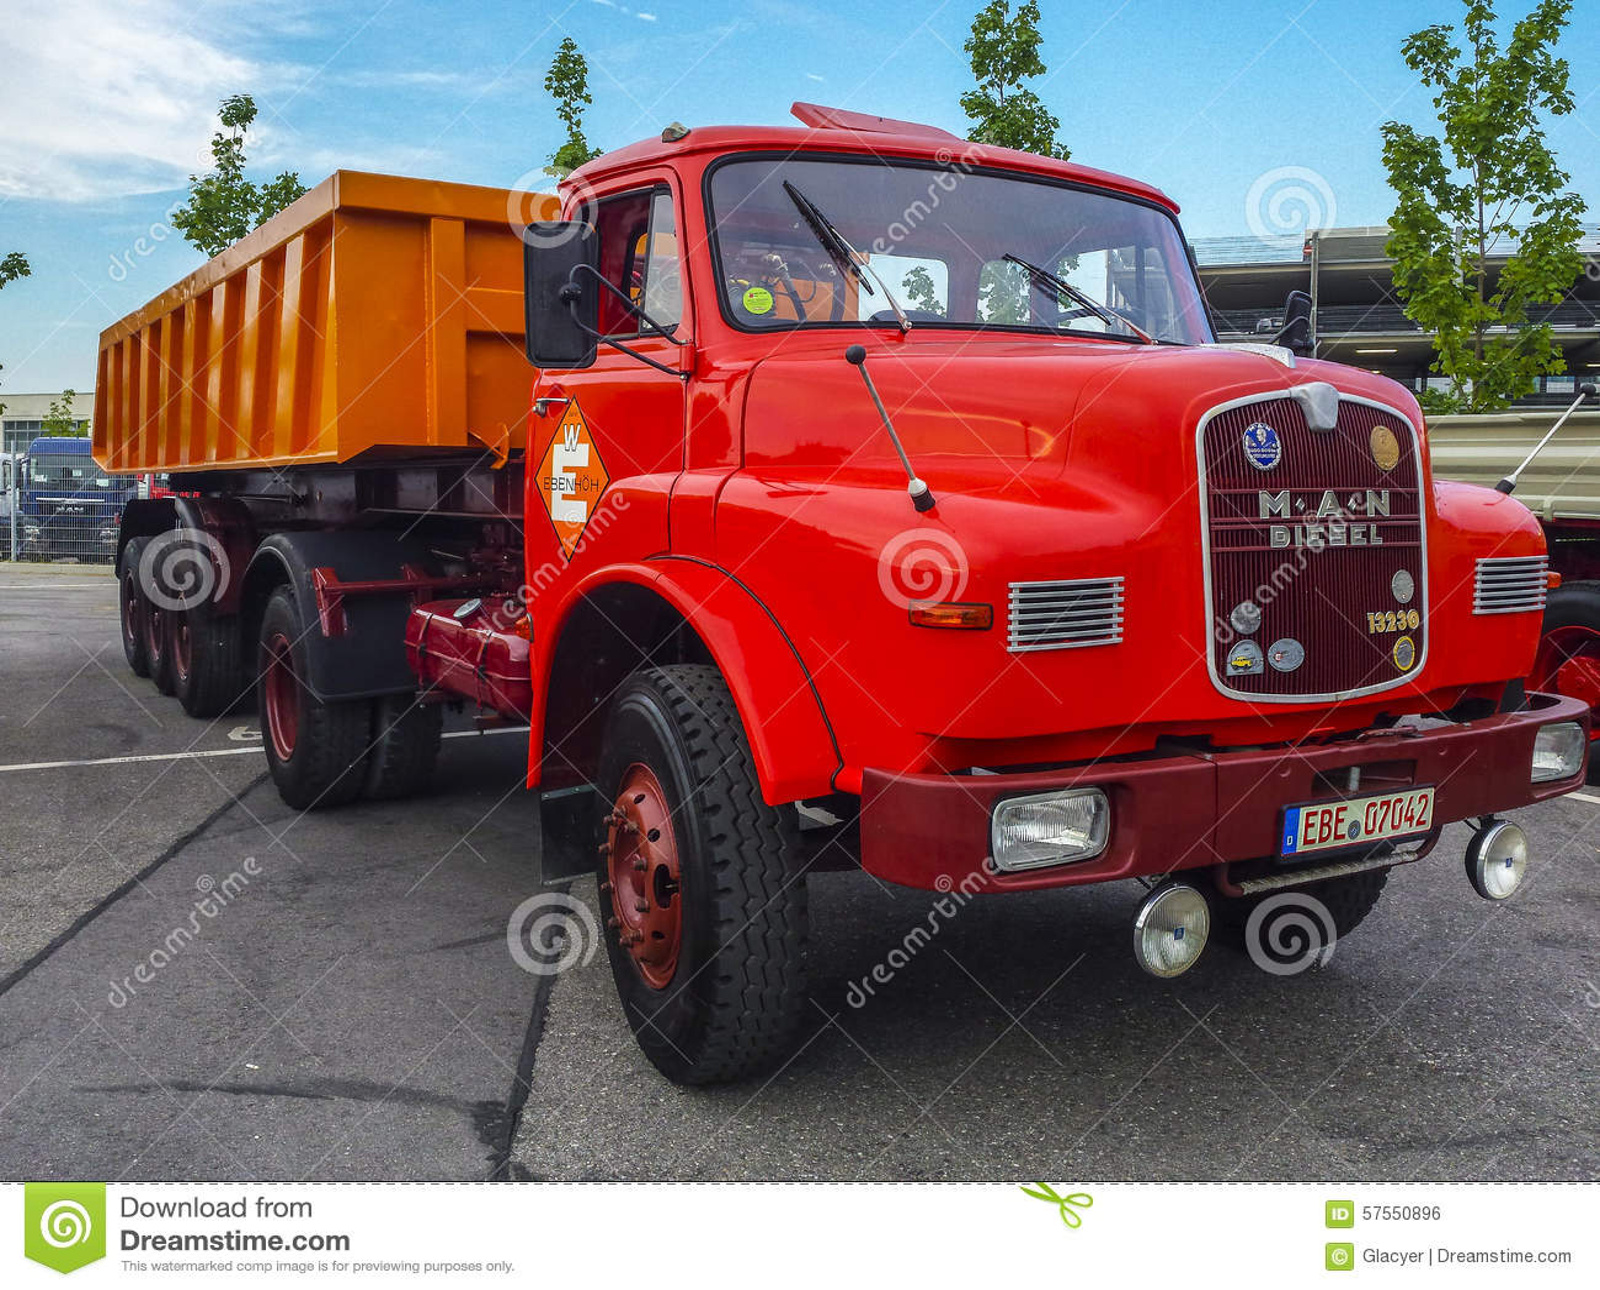 Old Man Truck Stock Photo 57550896 - Megapixl